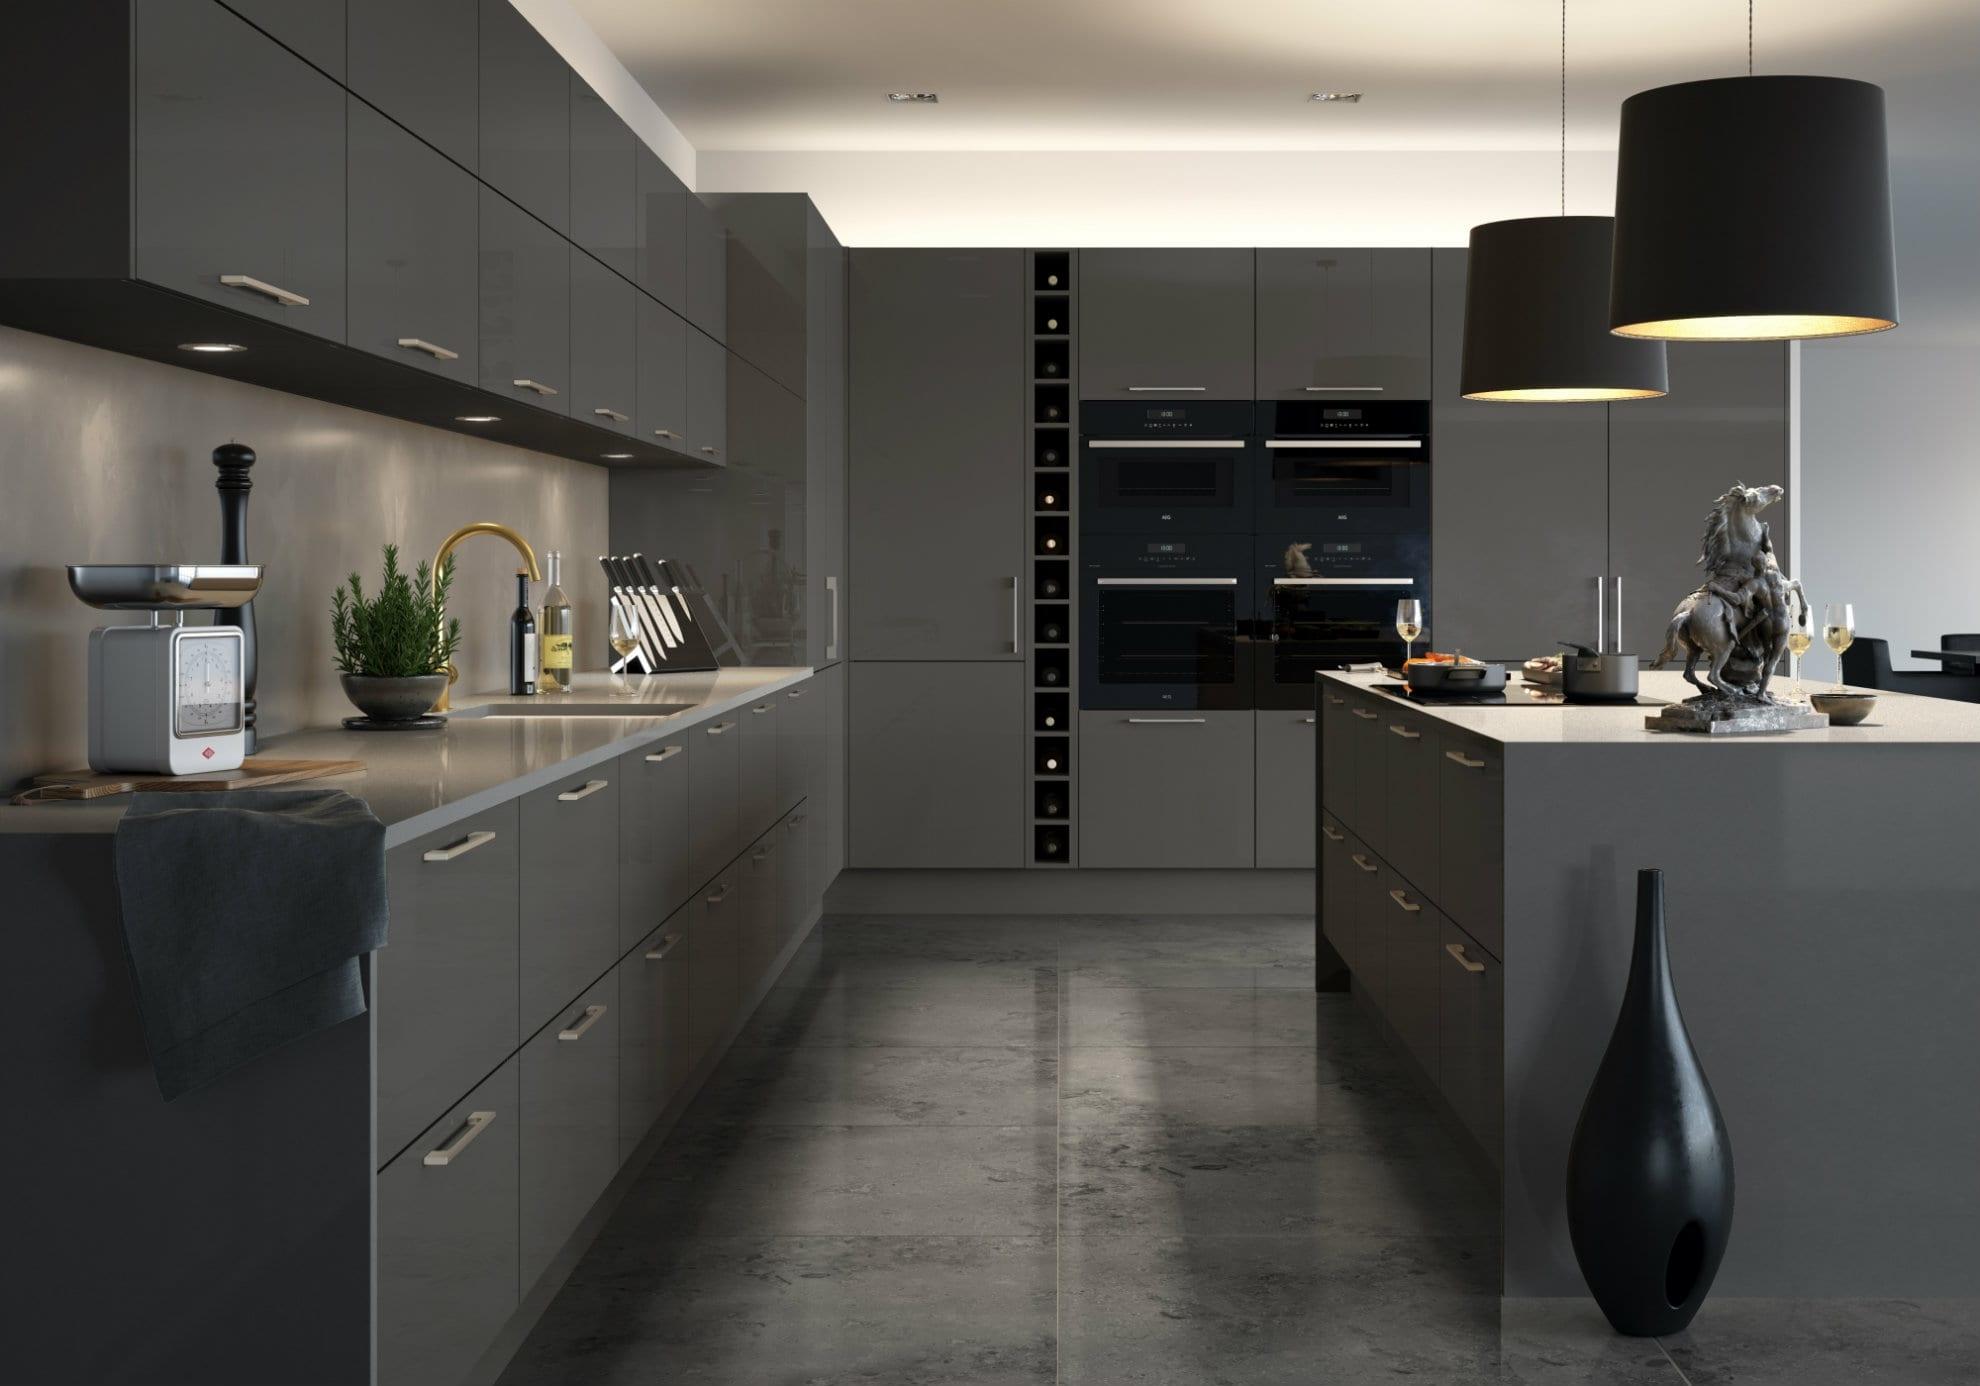 Napoli kitchen in medium grey